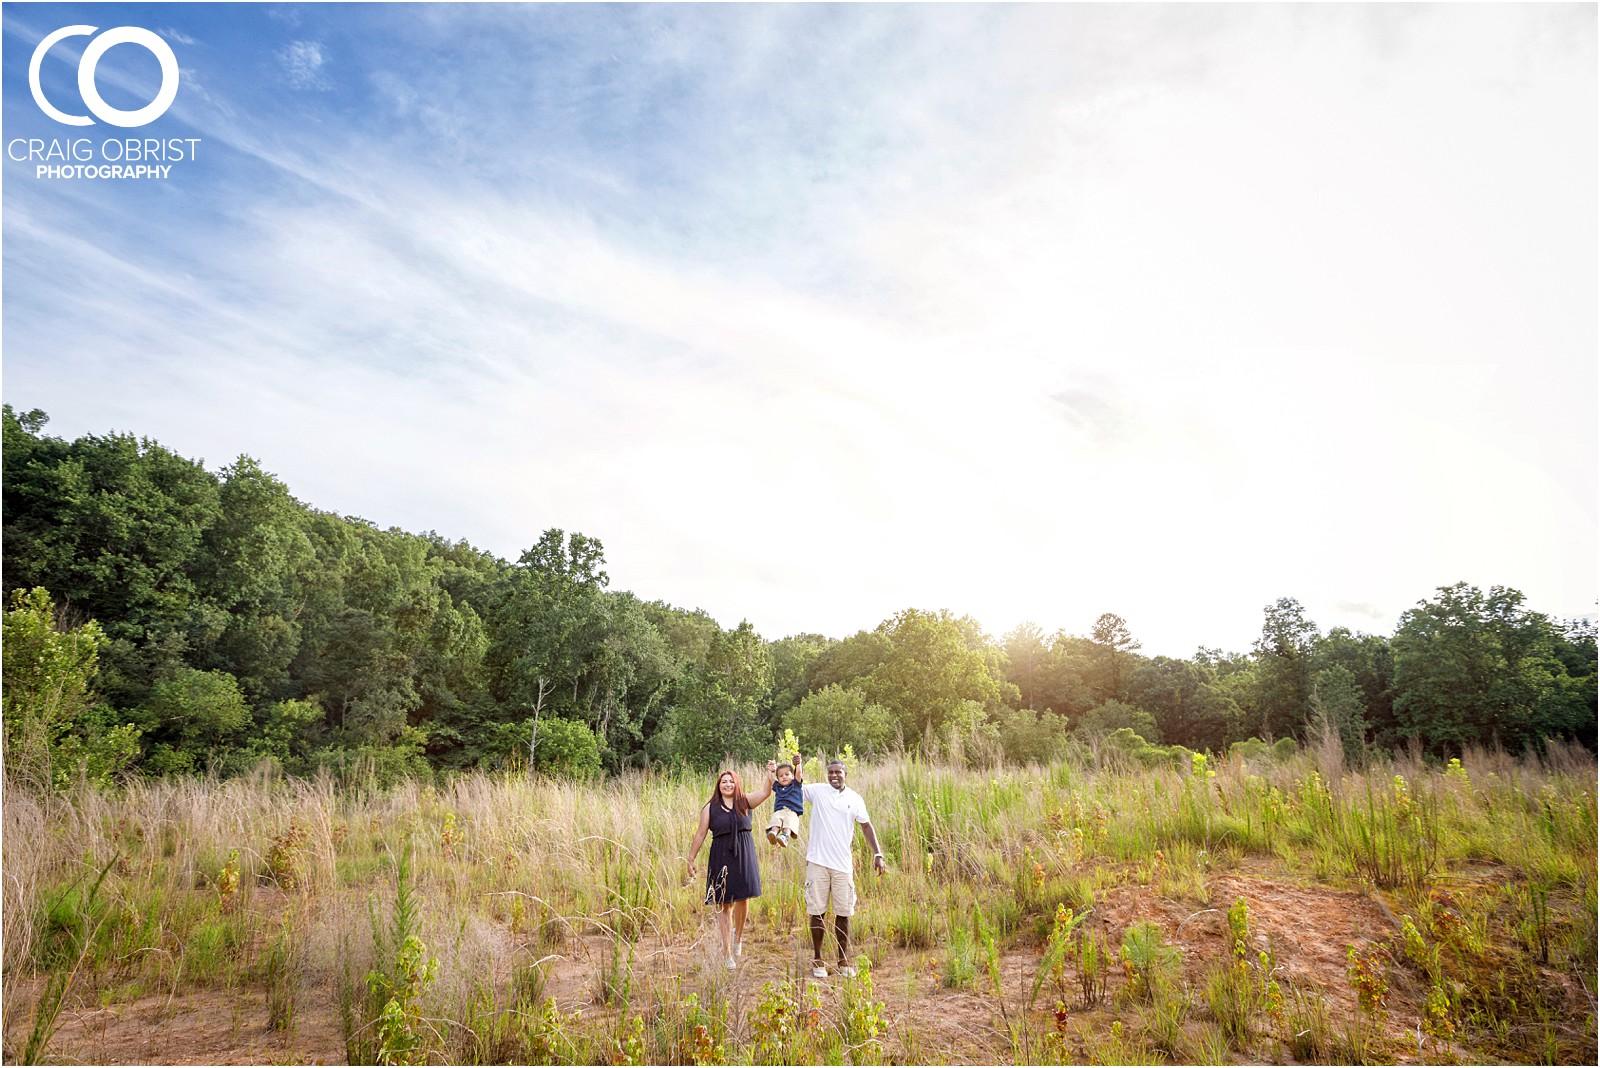 Grass Field Family Portratis Sunset Atlanta_0031.jpg